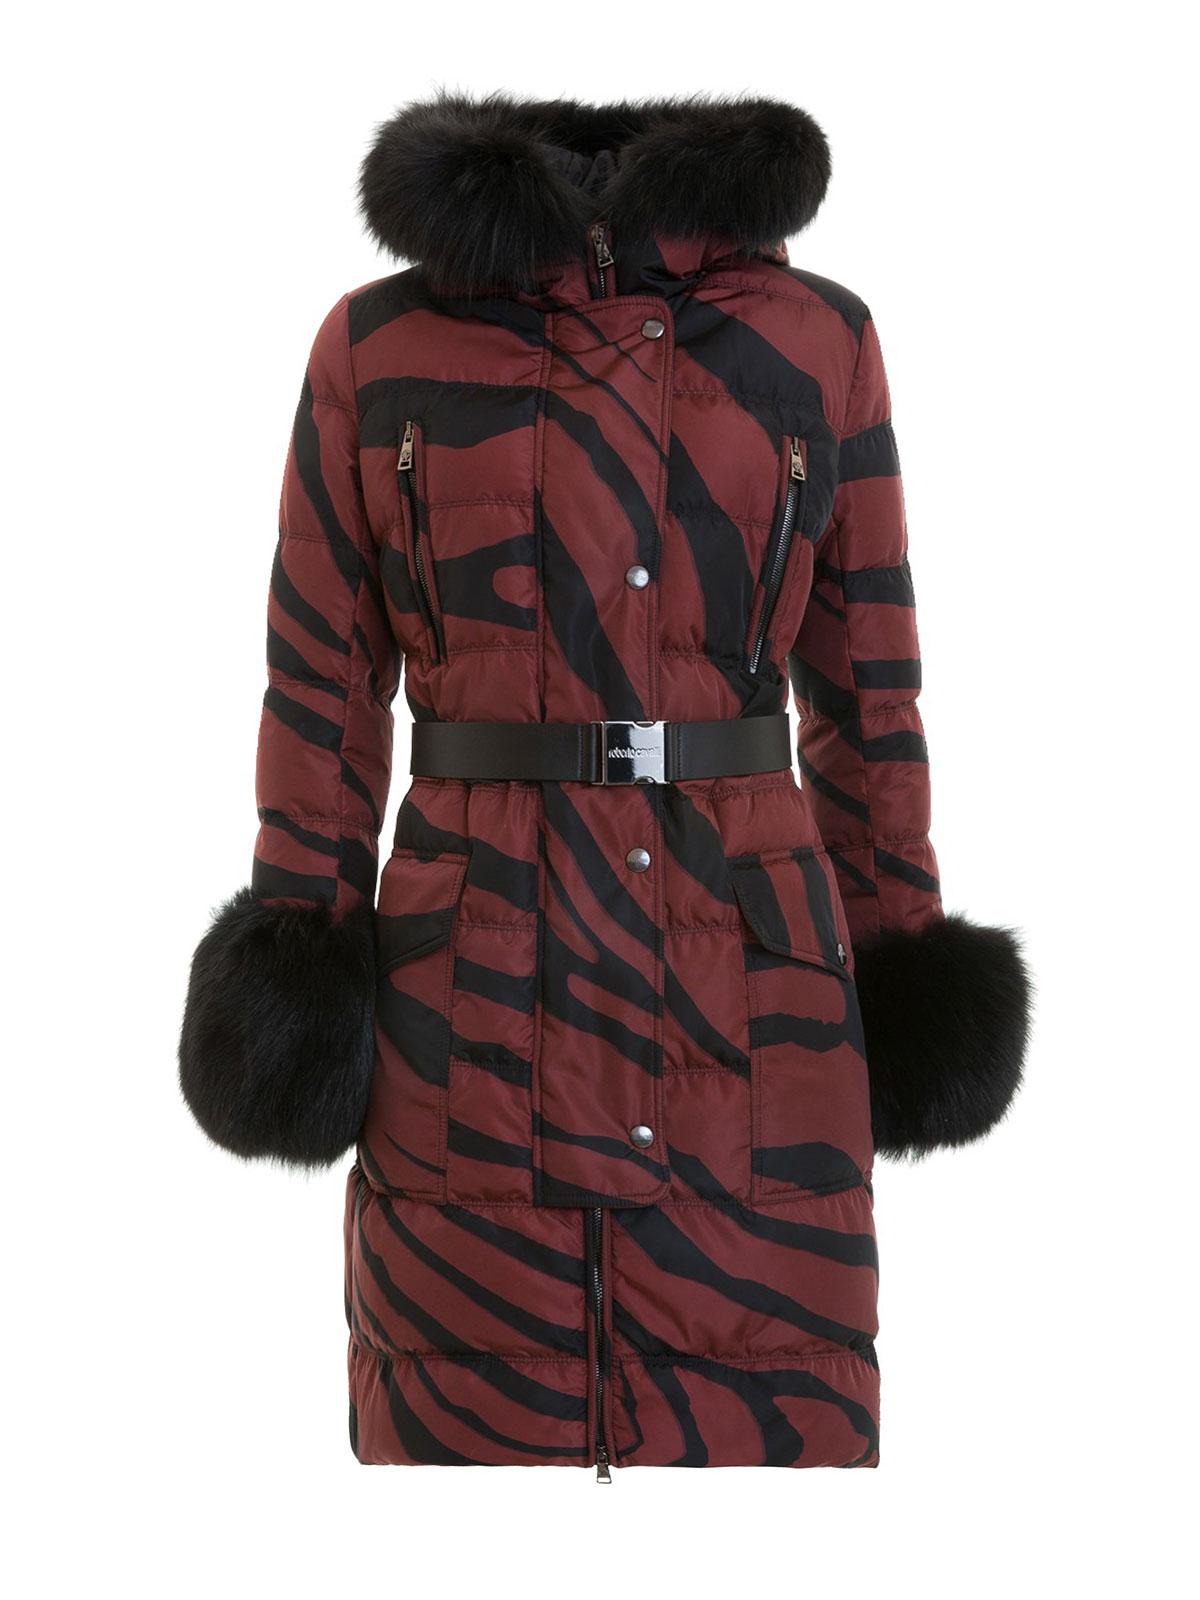 acf53b70a3c0 Roberto Cavalli - Macro Zebra print fur detail padded coat - padded ...